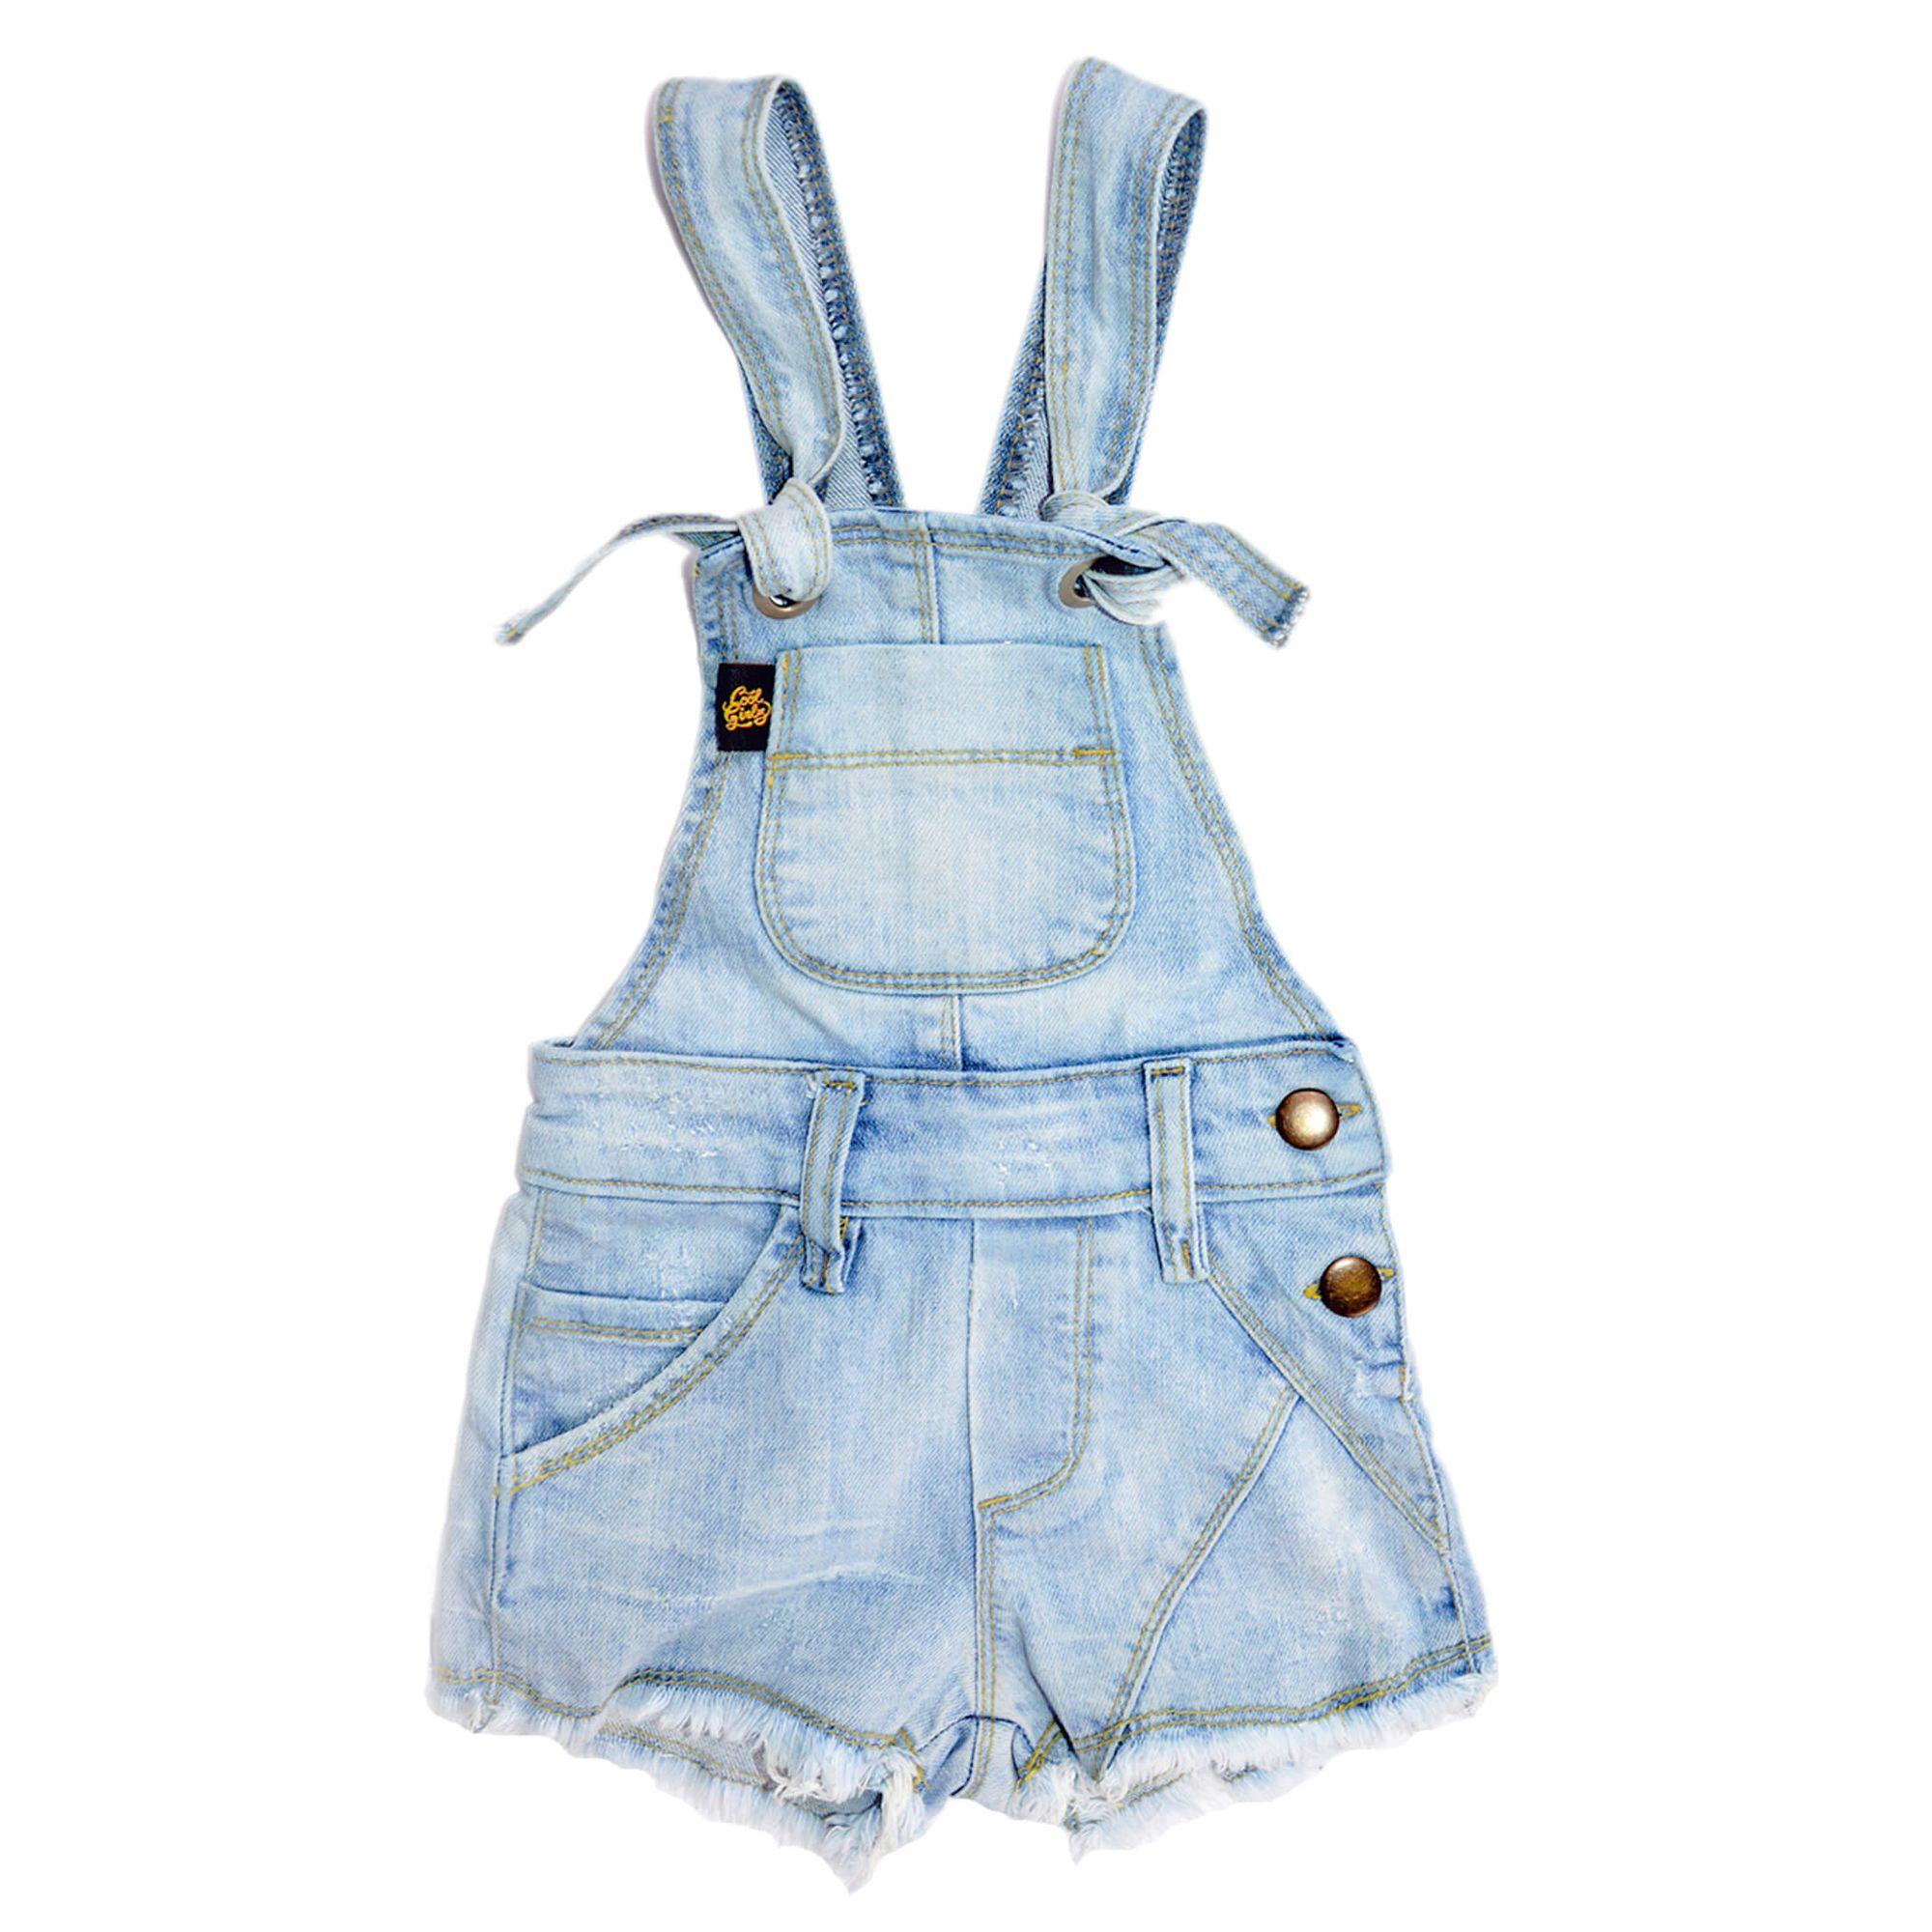 Jardineira infantil menina jeans claro cool girlz ecameleca for Jardineira jeans infantil c a